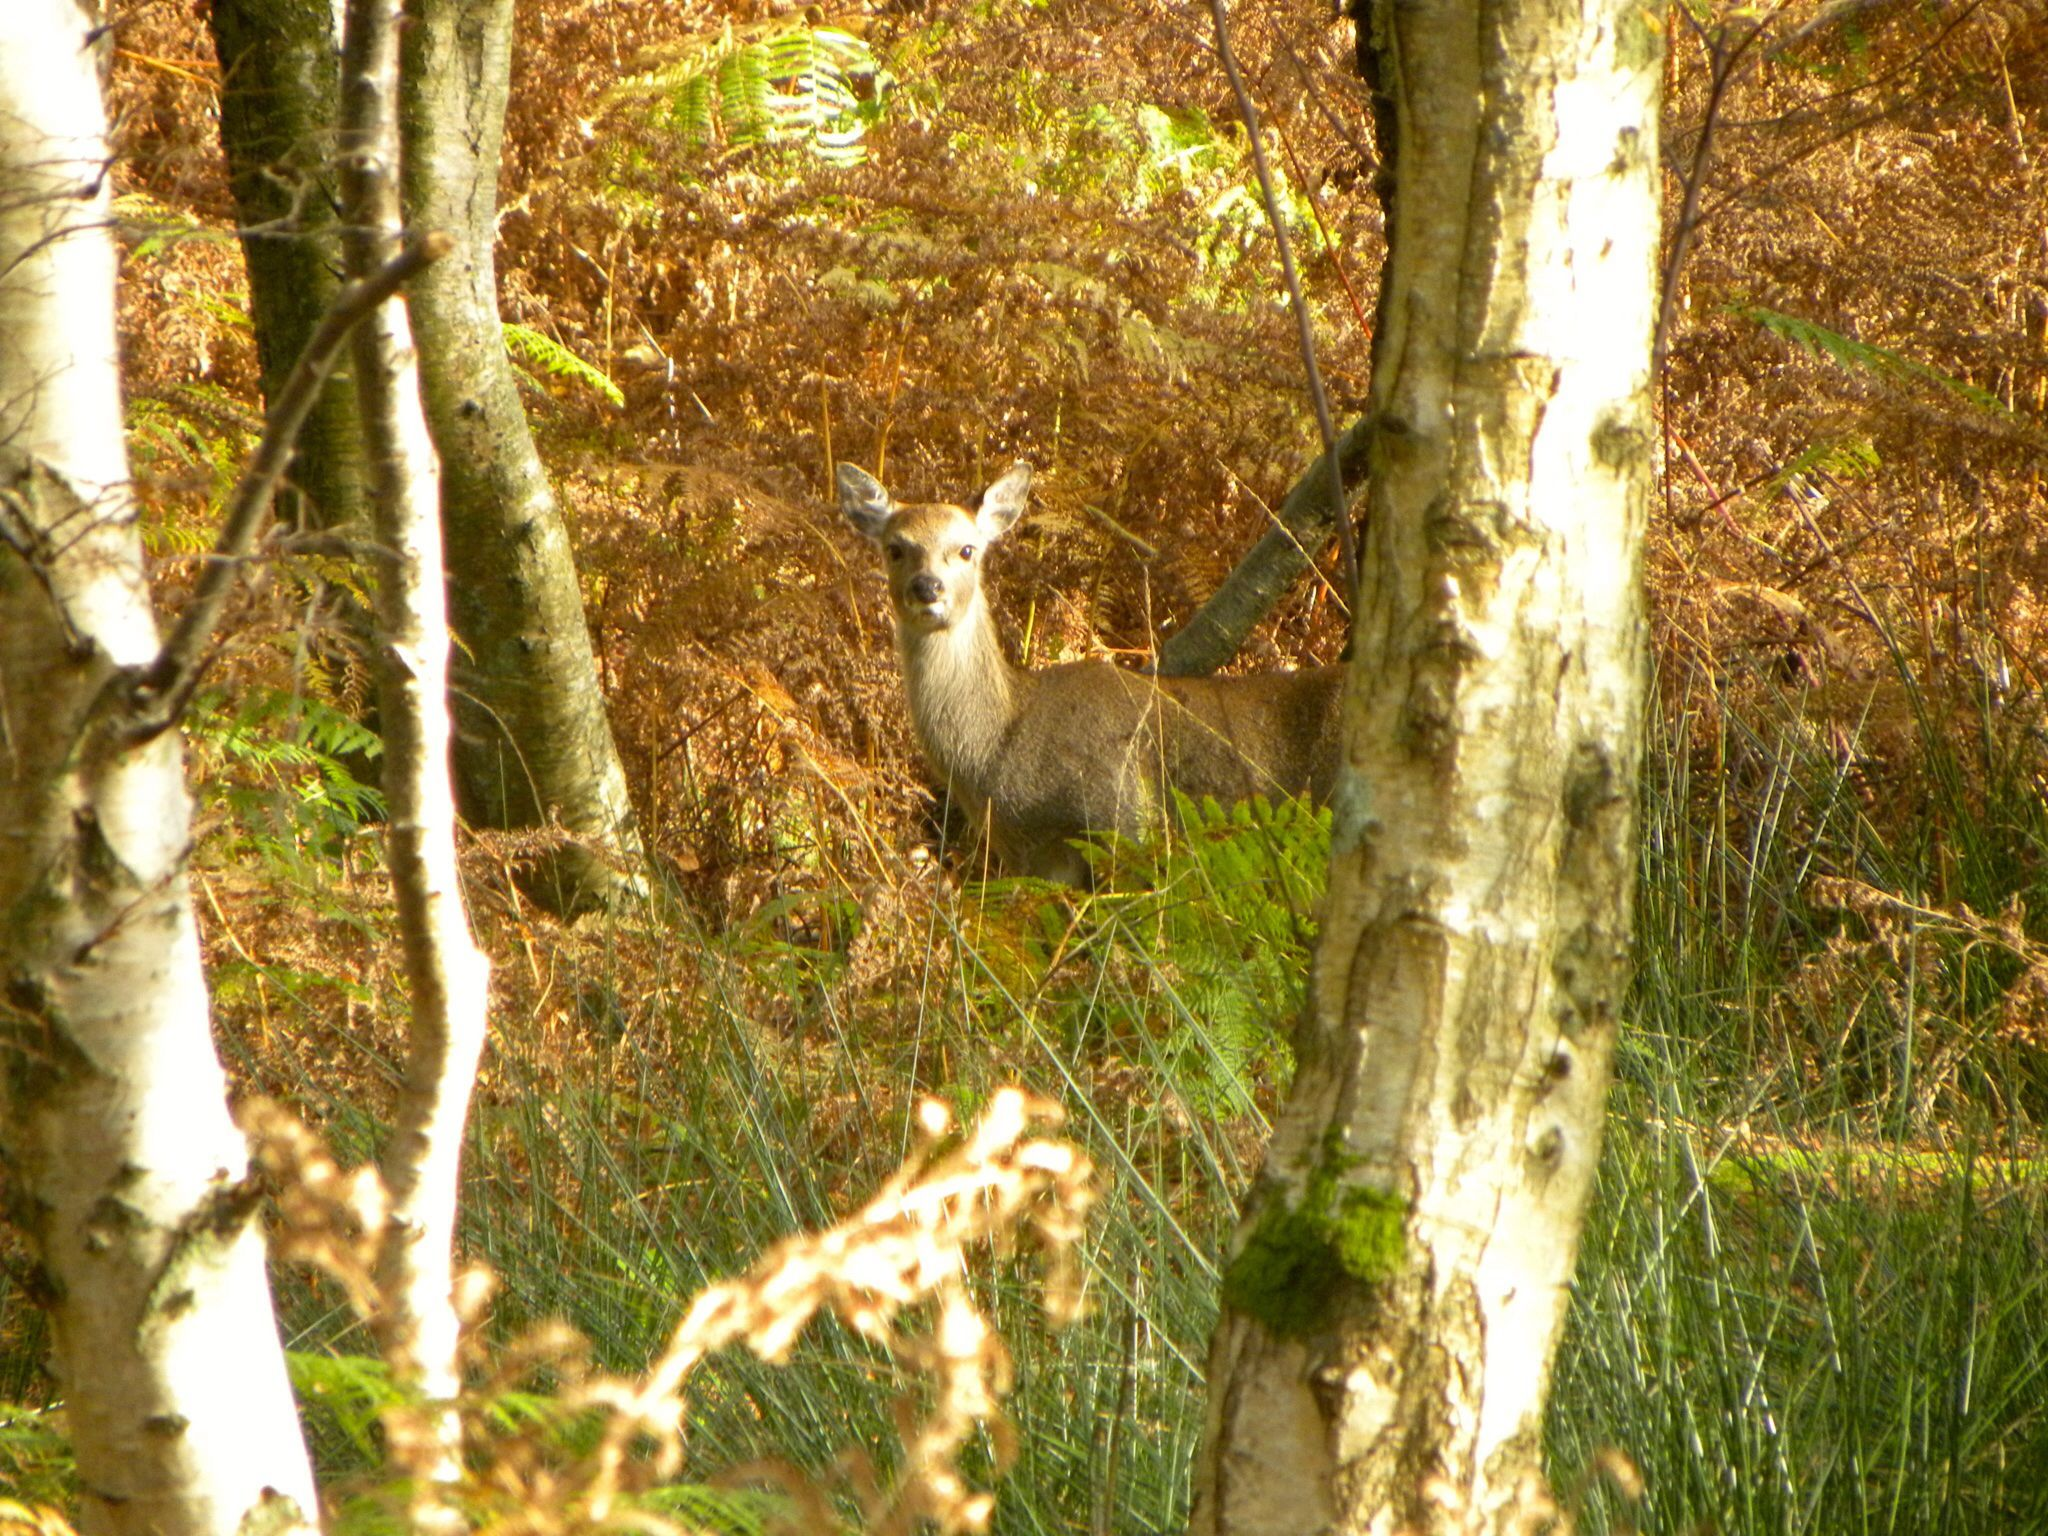 Autumn at Arne Nature Reserve, Purbeck, Dorset. England